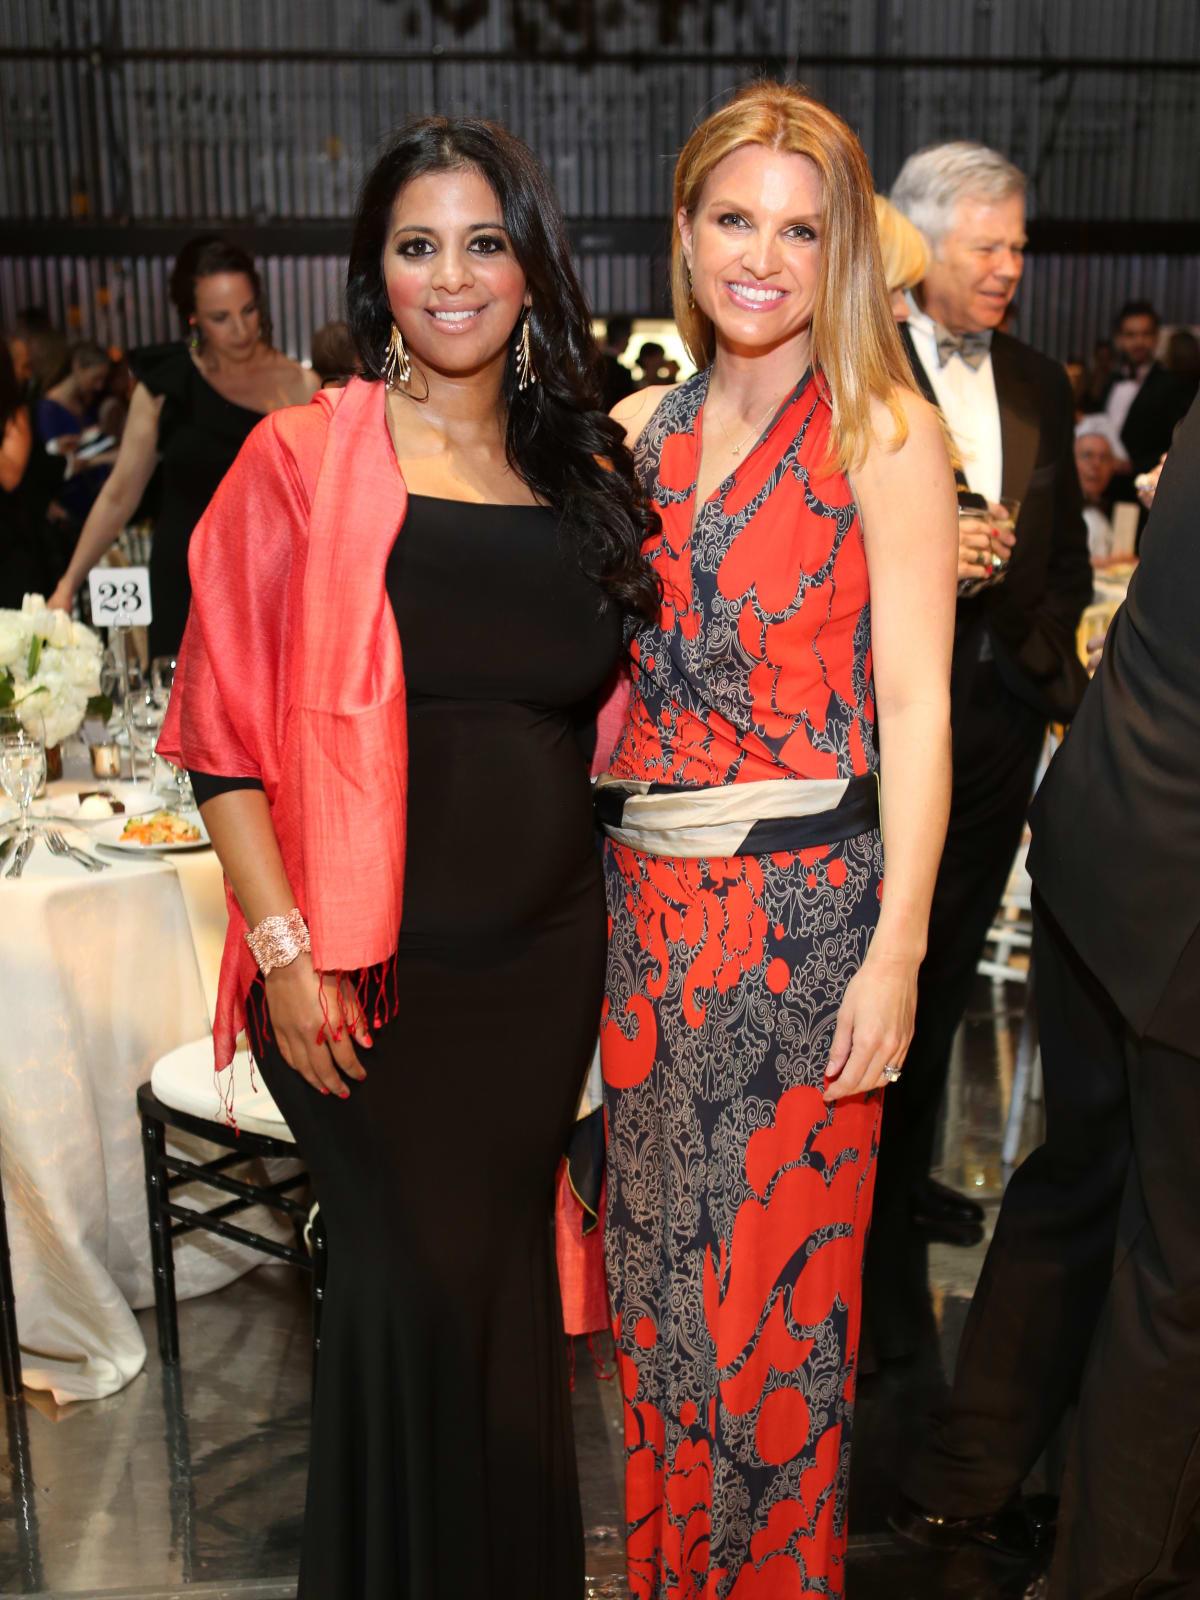 Mercury Gala April 2016, Elizabeth Abraham Colombowala, Lindley Arnoldy